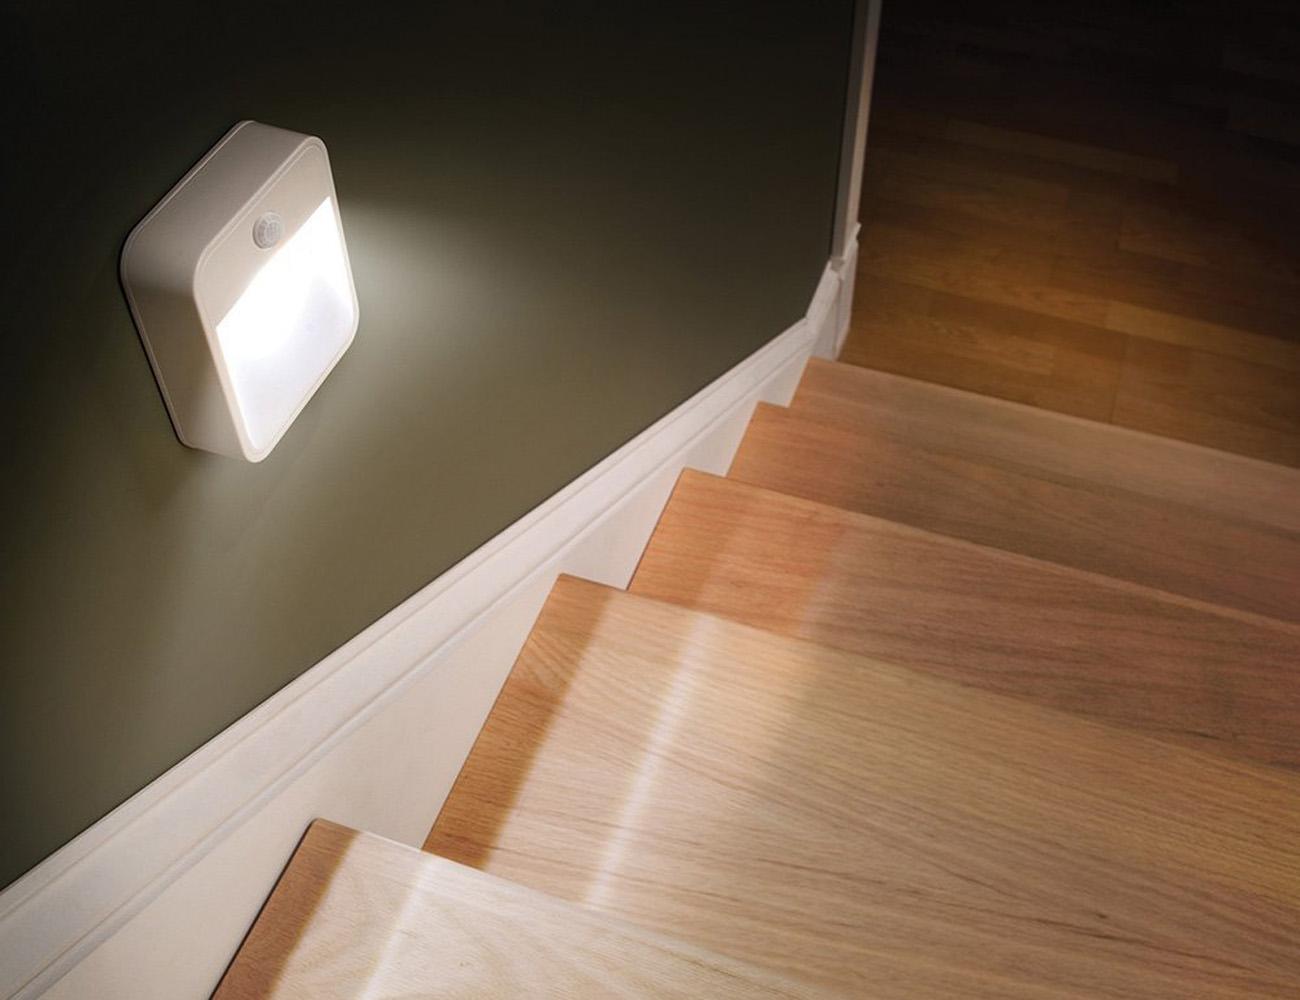 Mr Beams Wireless Motion Sensing Led Nightlights 187 Gadget